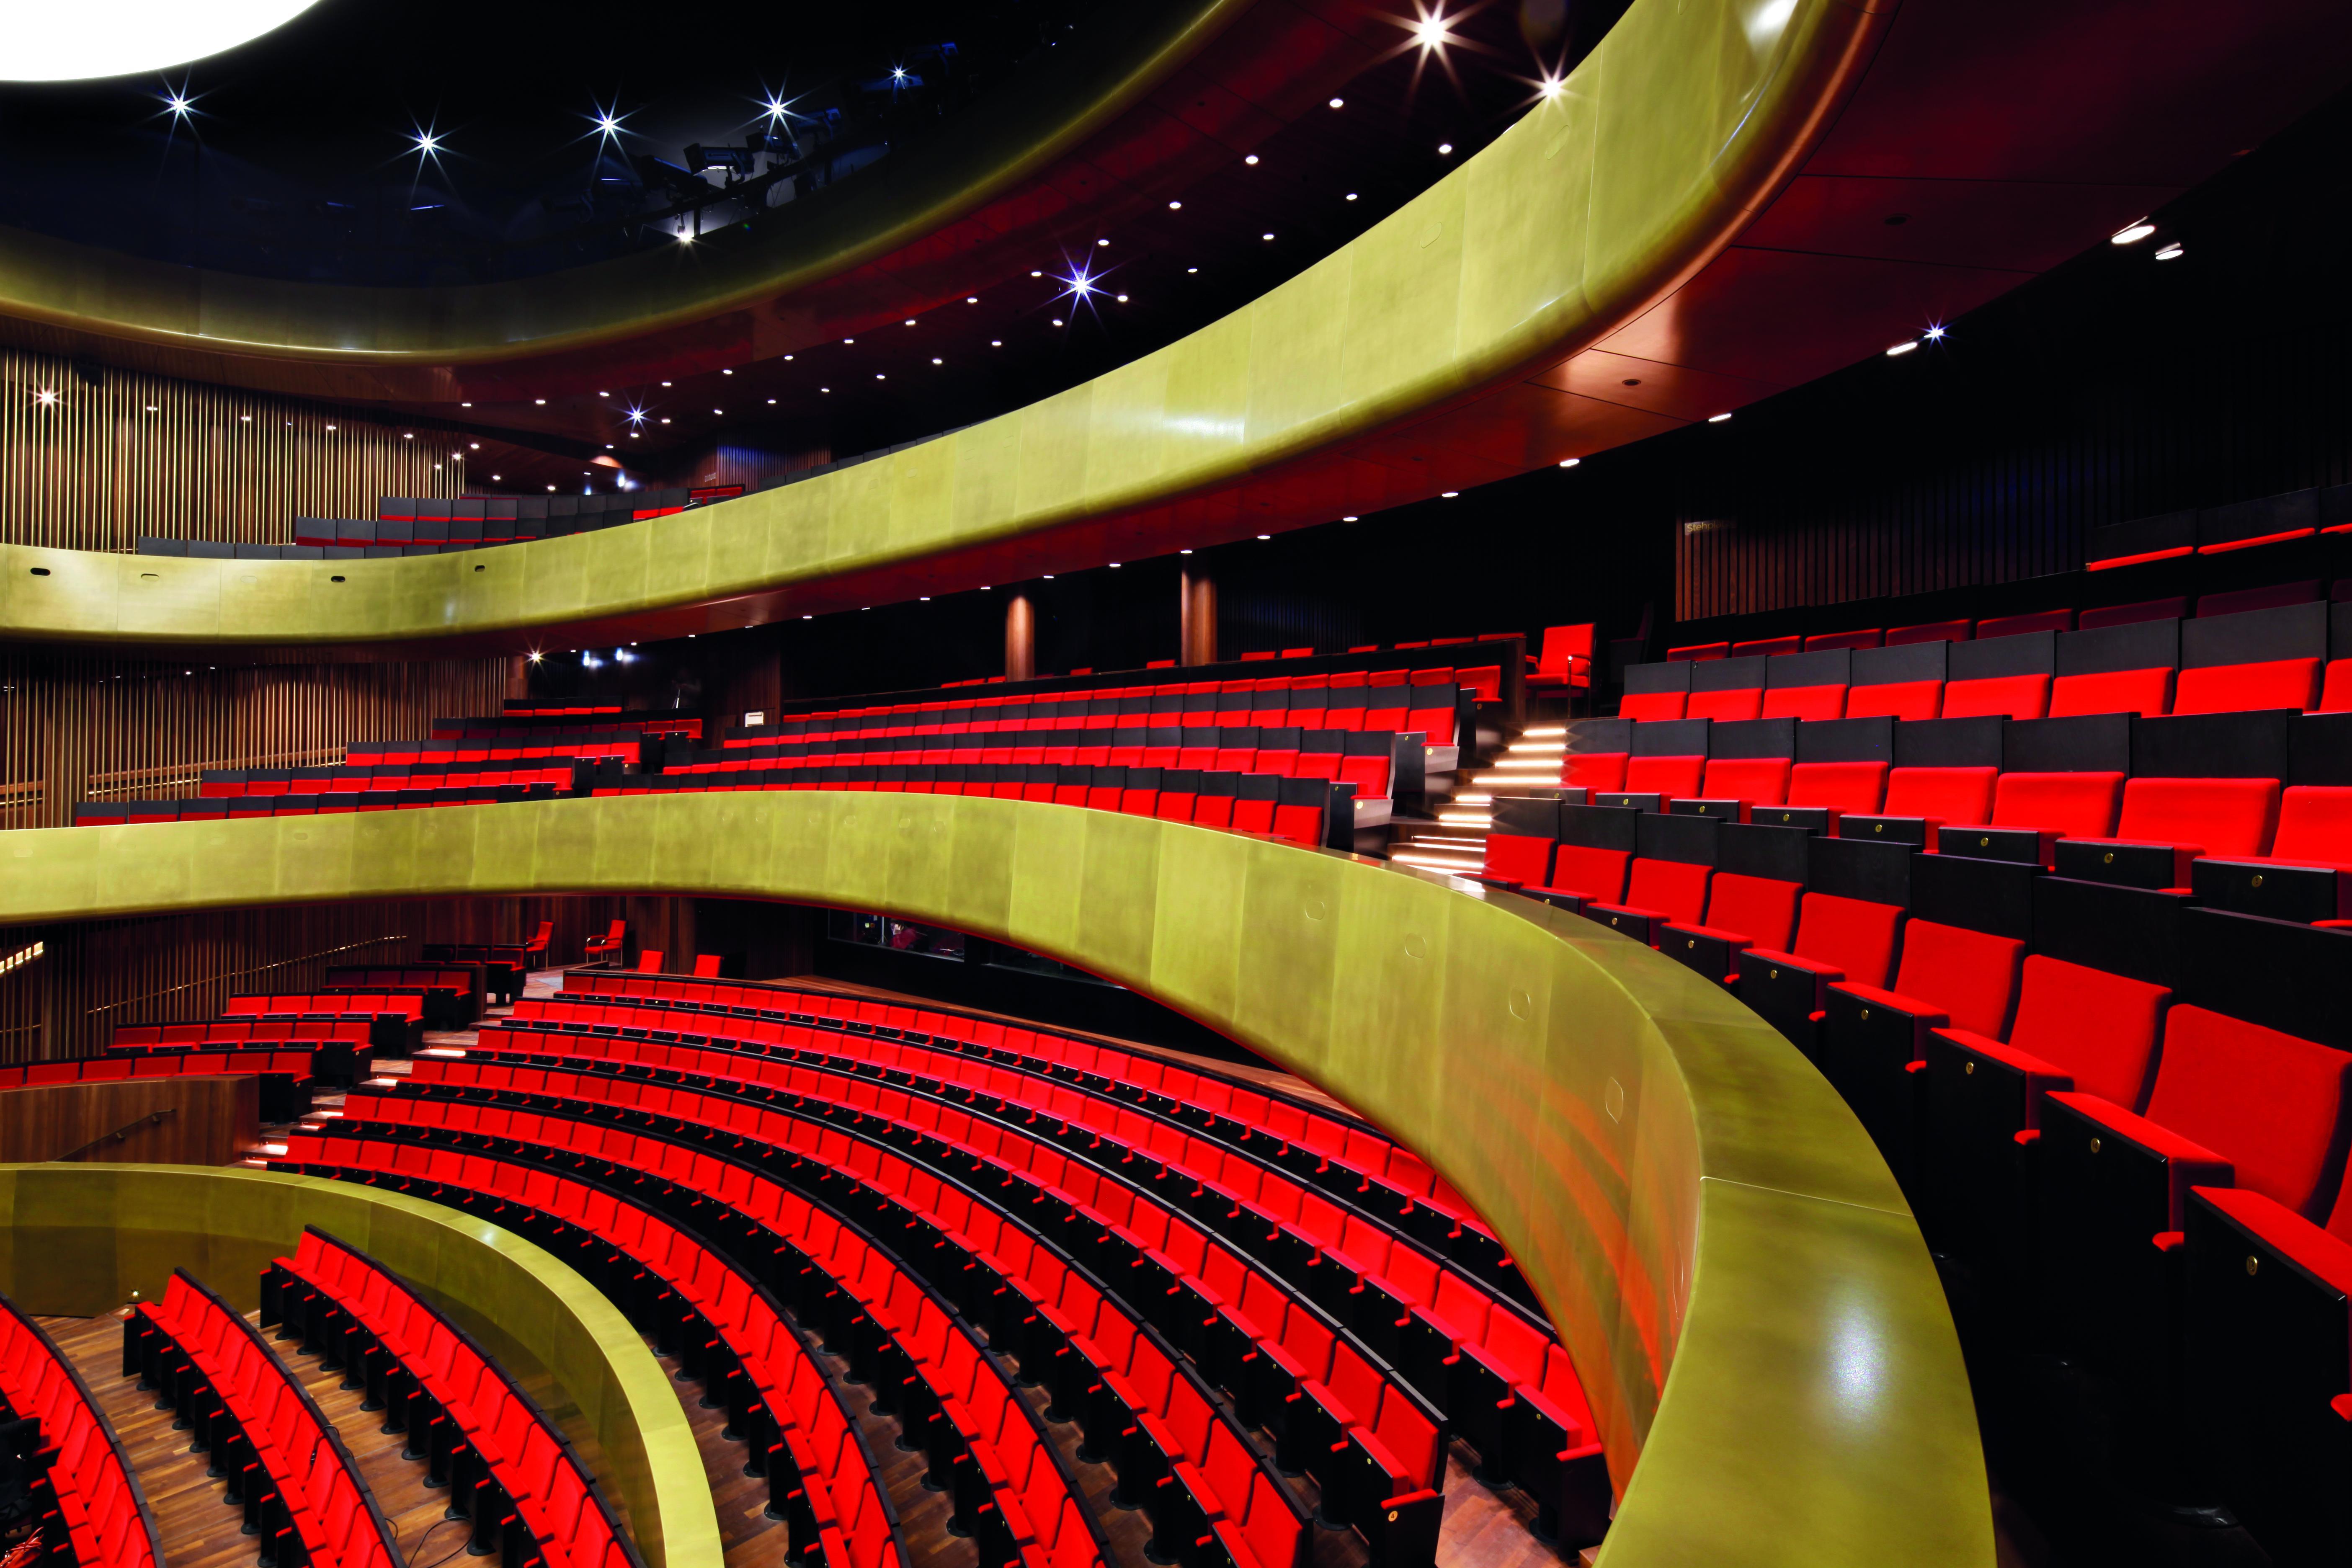 Musiktheater, Linz